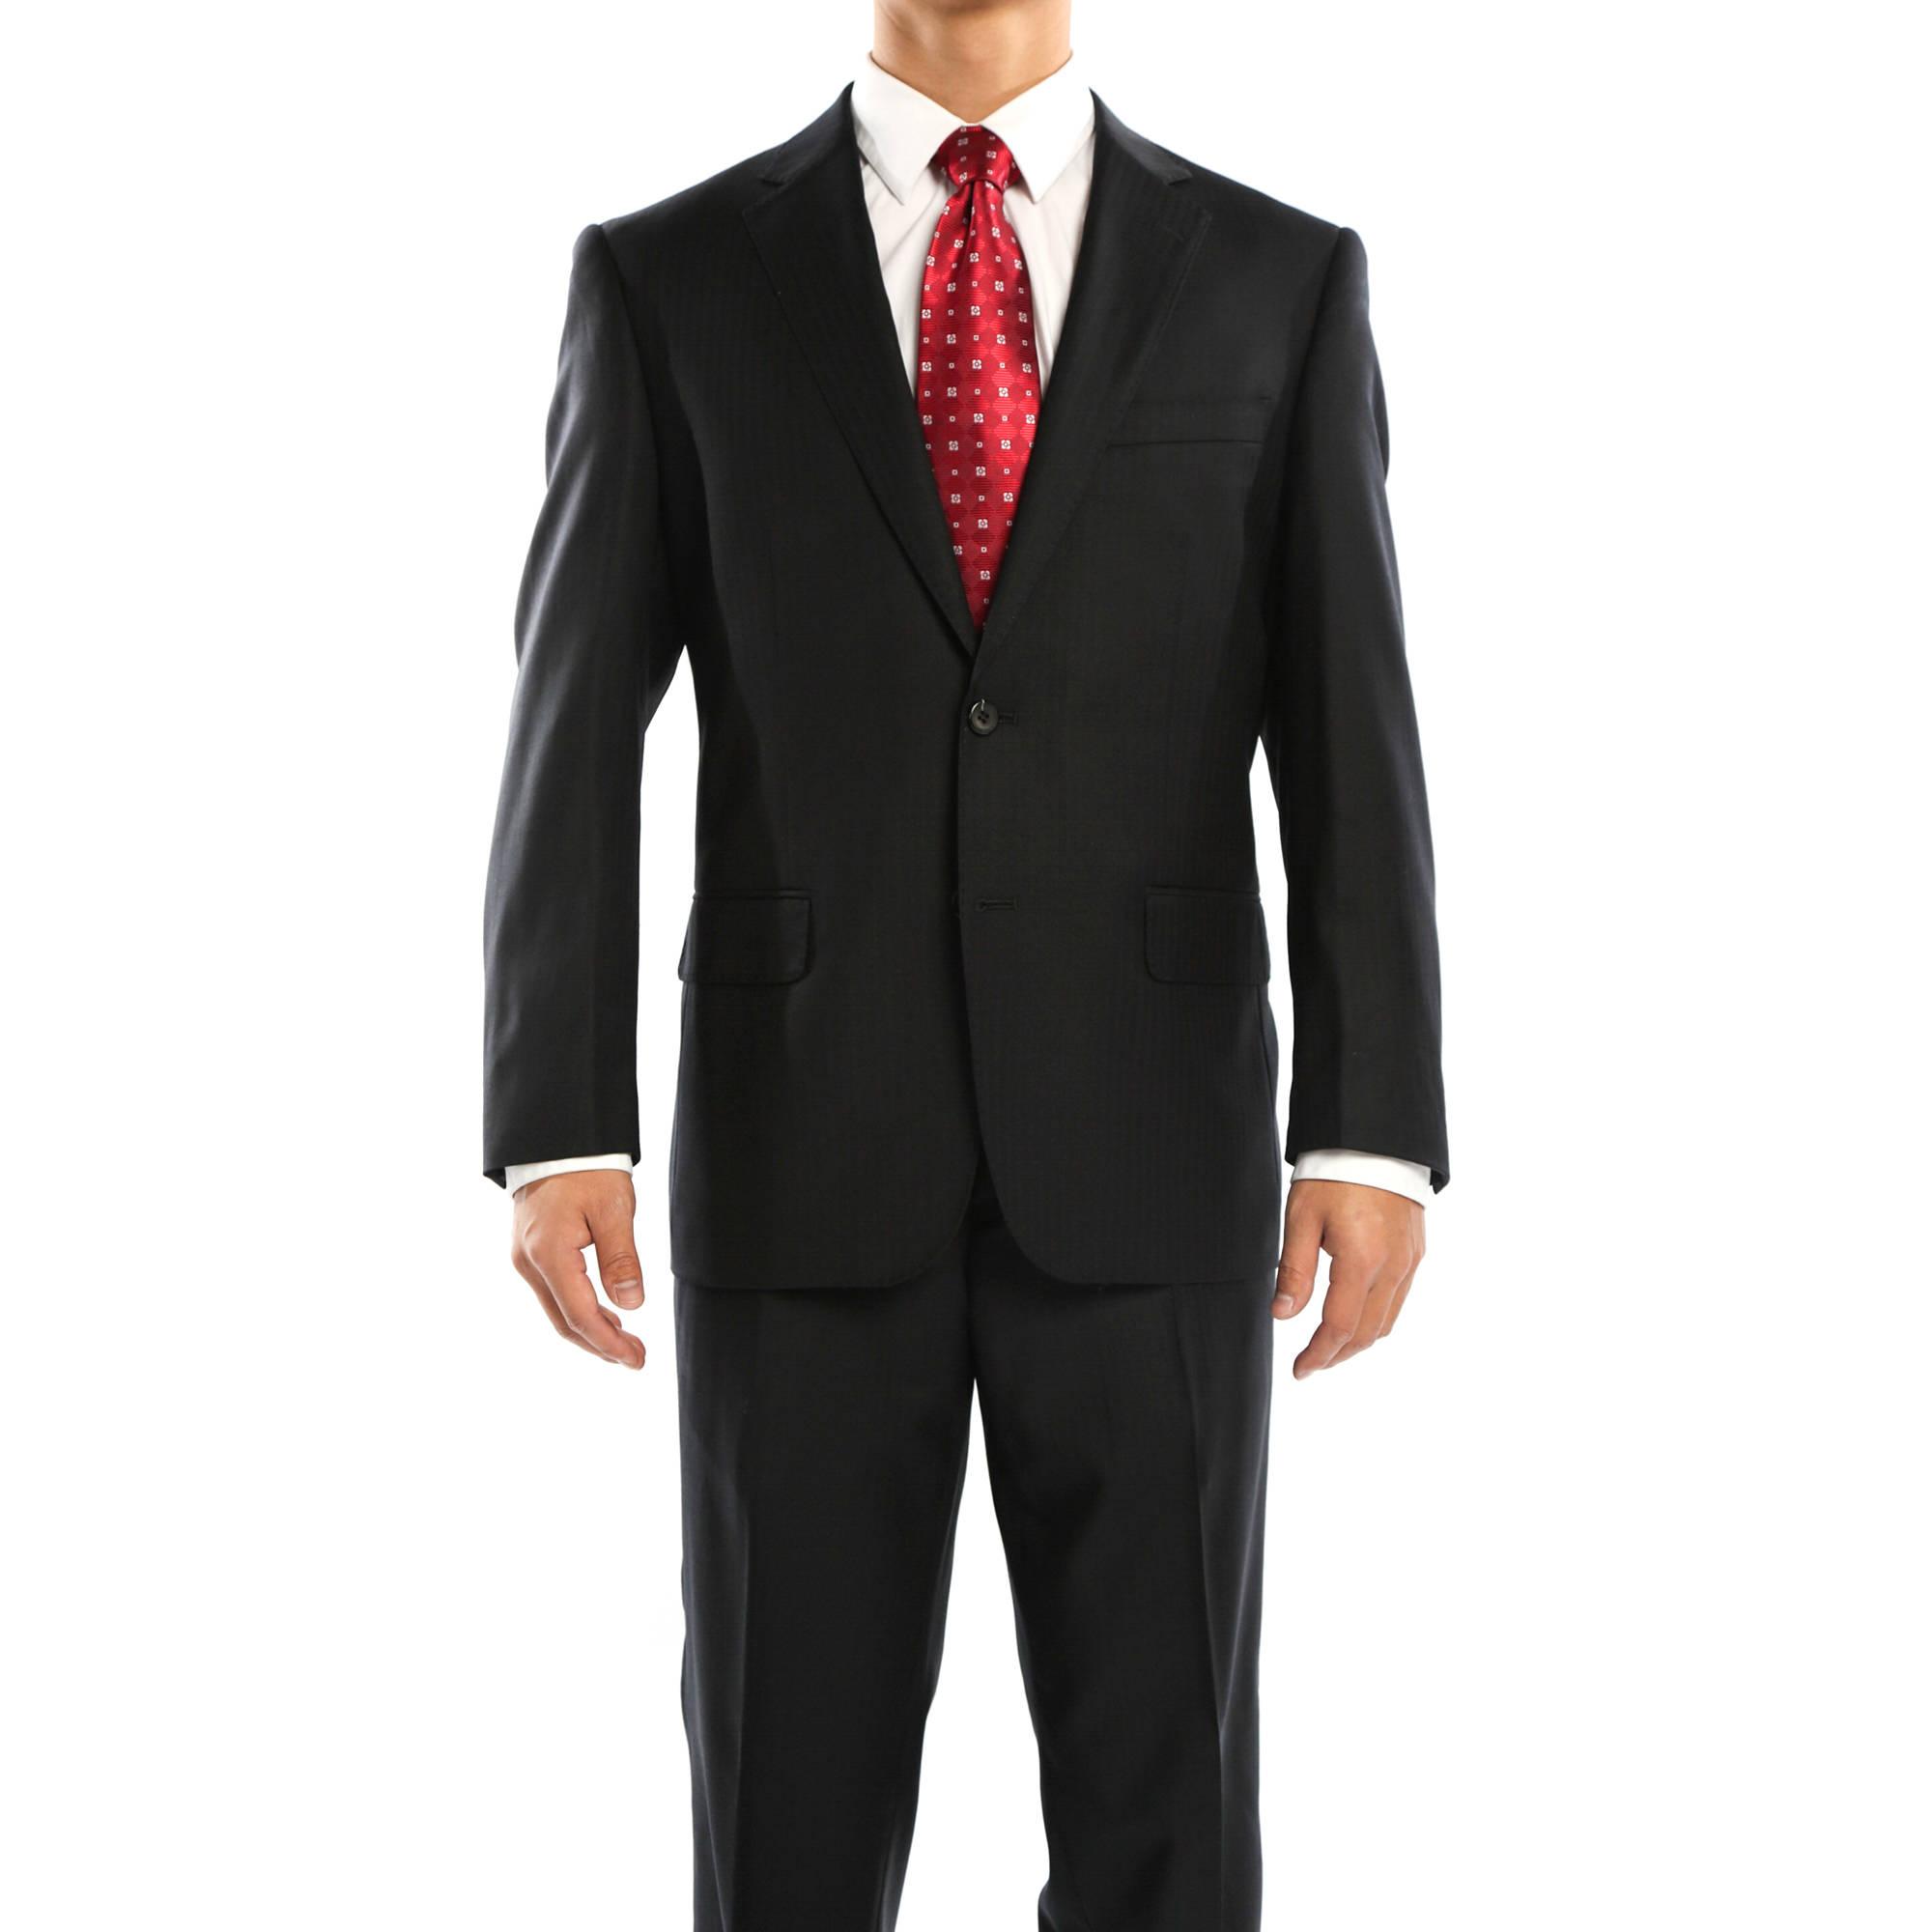 Revelino Big Men's Black Classic Fit Italian Styled Virgin Wool Suit